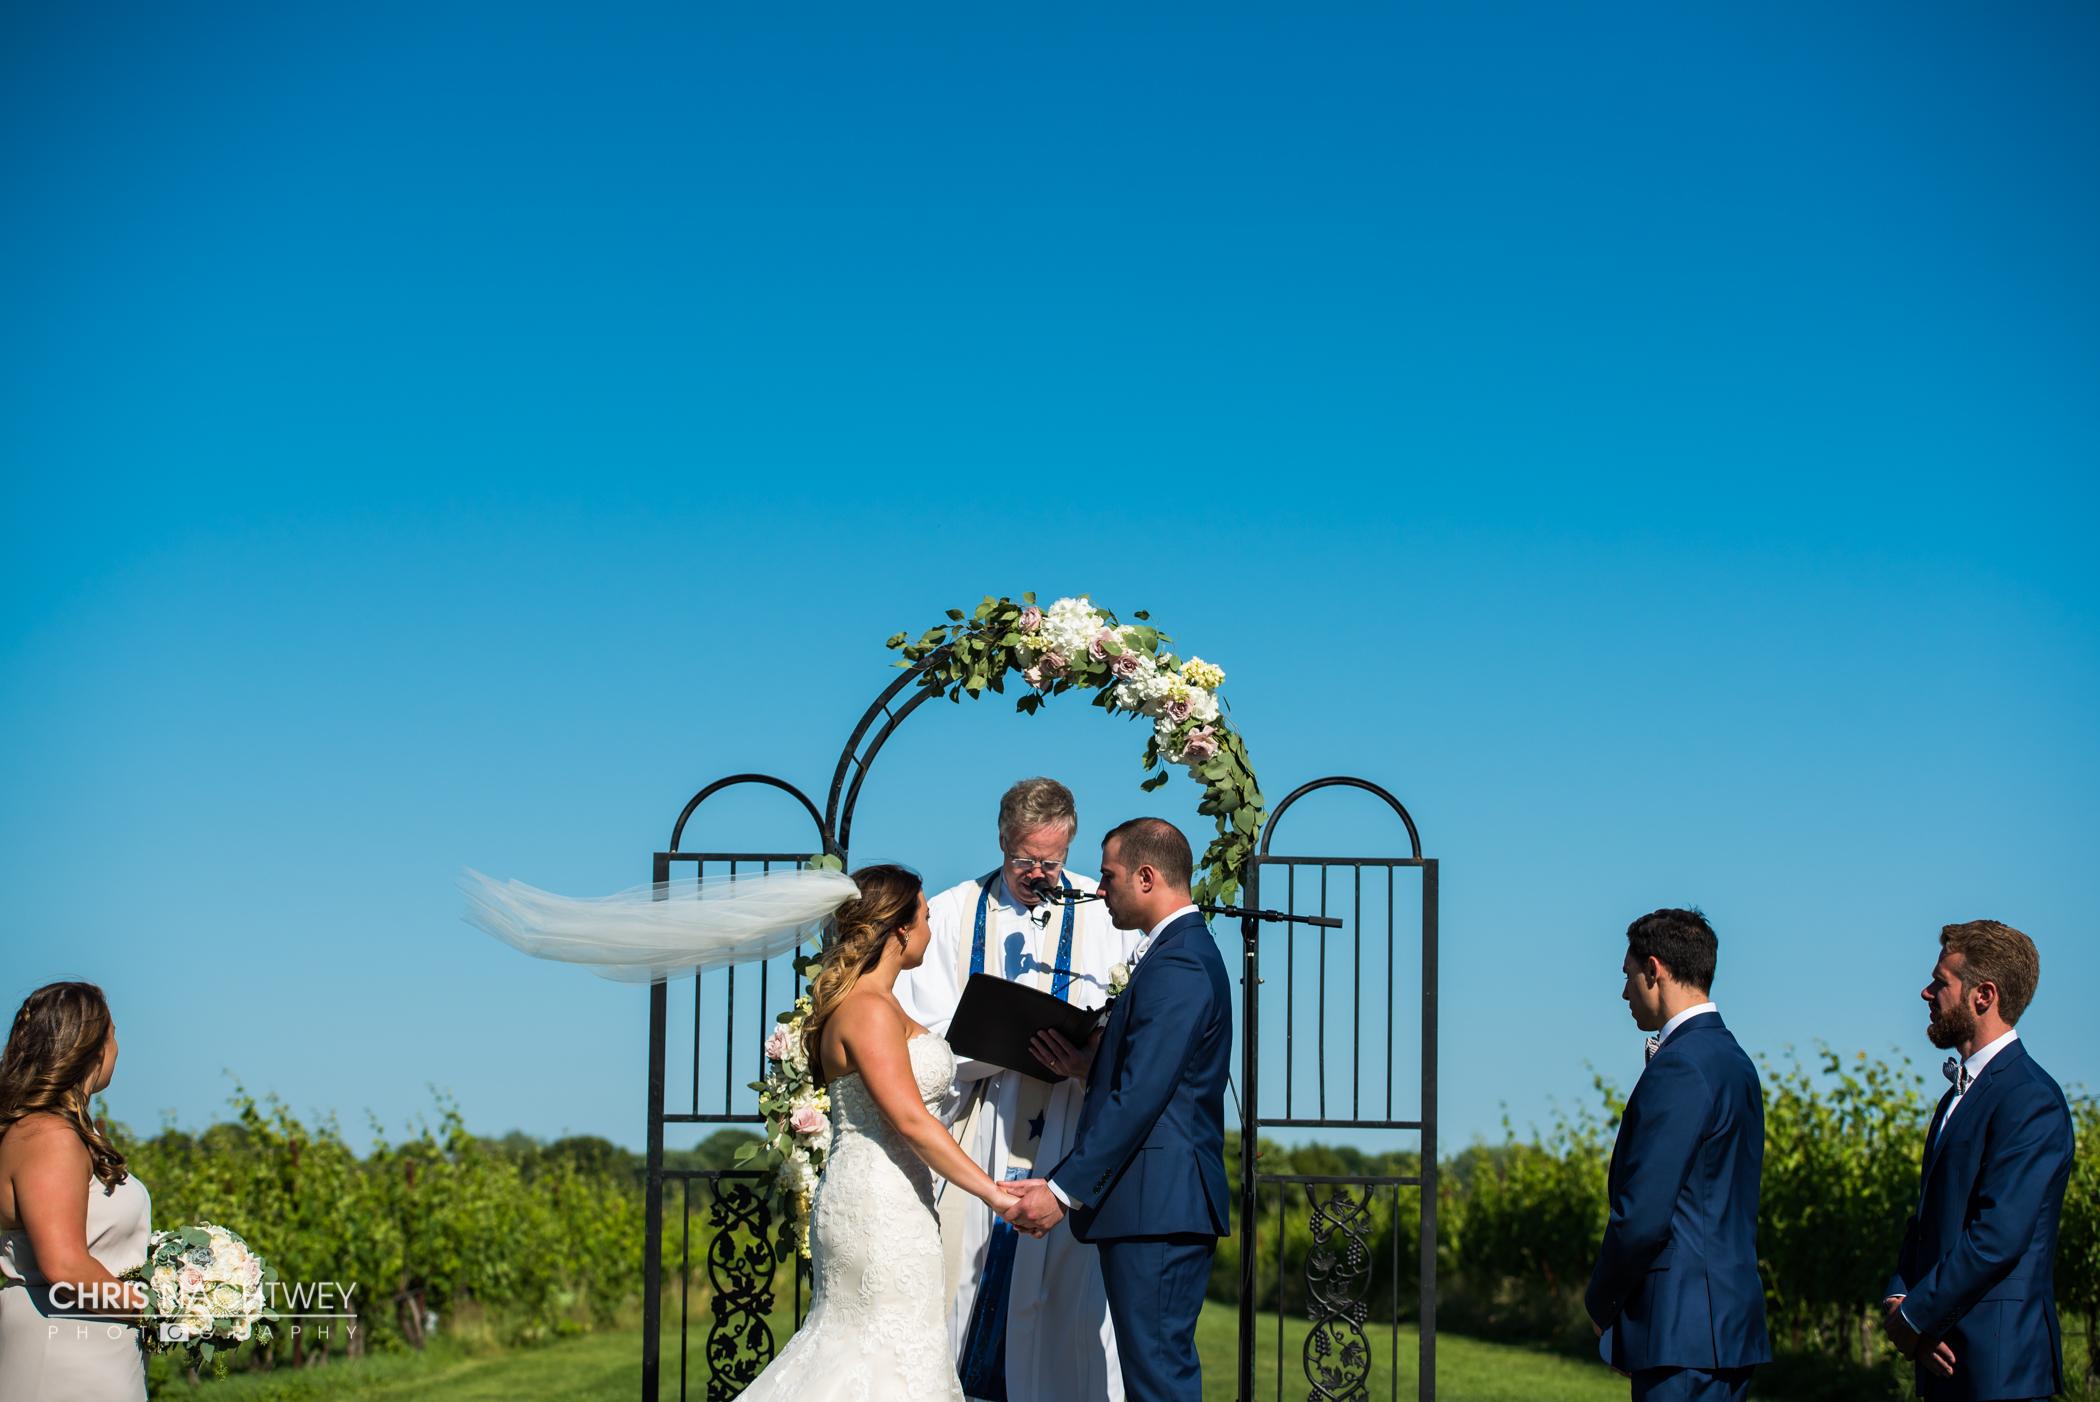 saltwater-farm-vineyard-wedding-photos-lindsay-gabe-chris-nachtwey-photography-2017-34.jpg